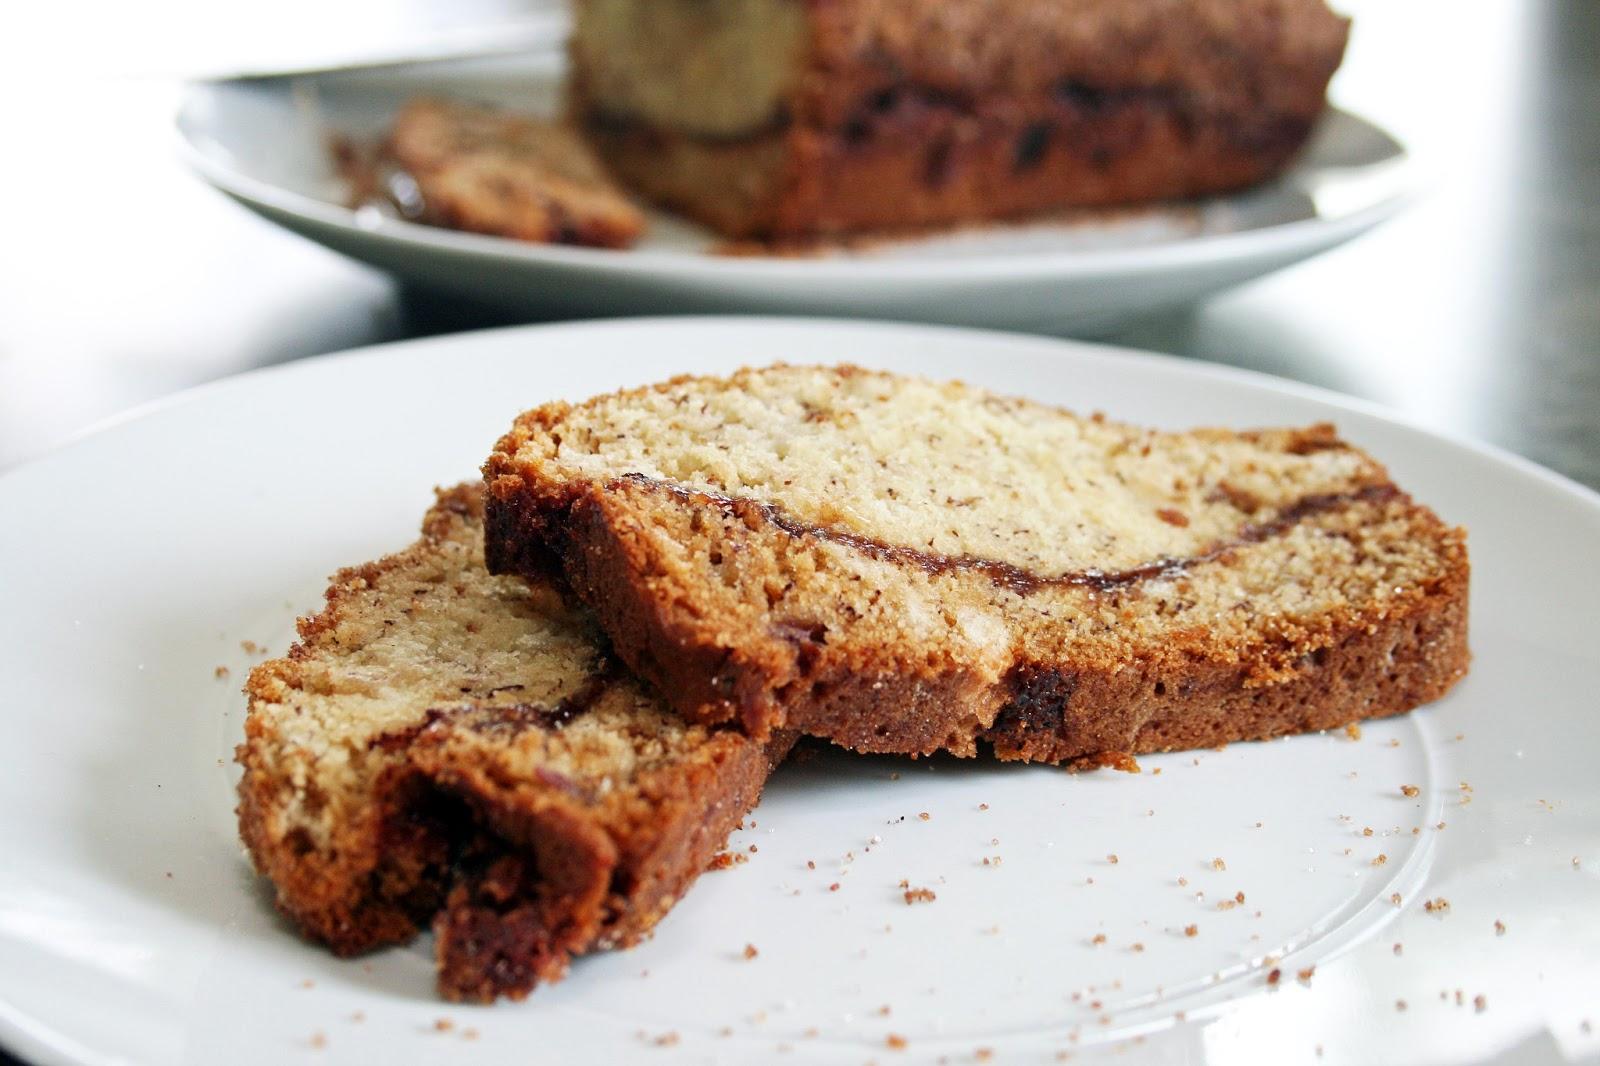 Lazy Gluten Free: Gluten Free Cinnamon Swirl Banana Bread